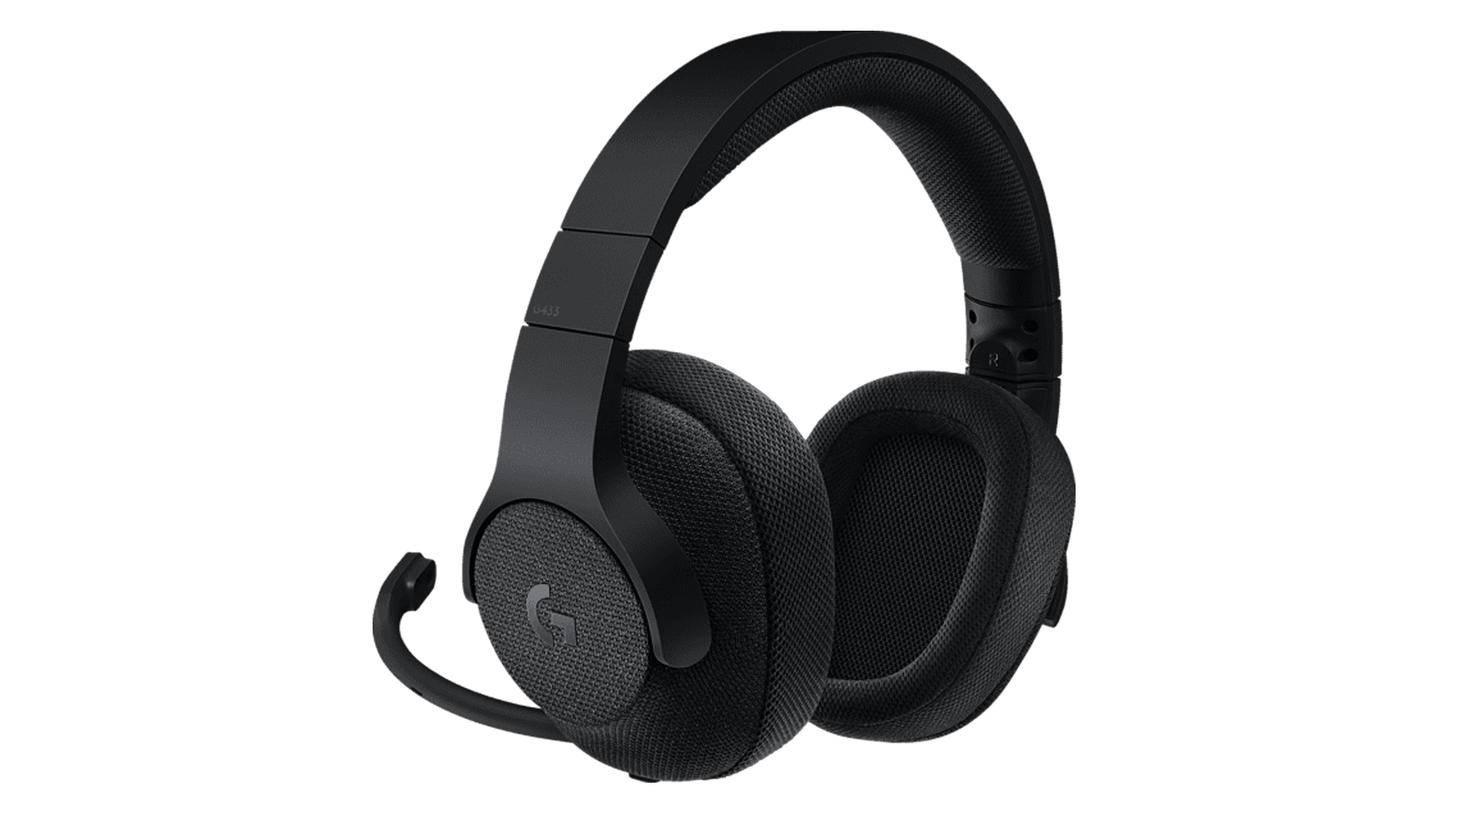 Logitech G433 Surround Gaming Headset